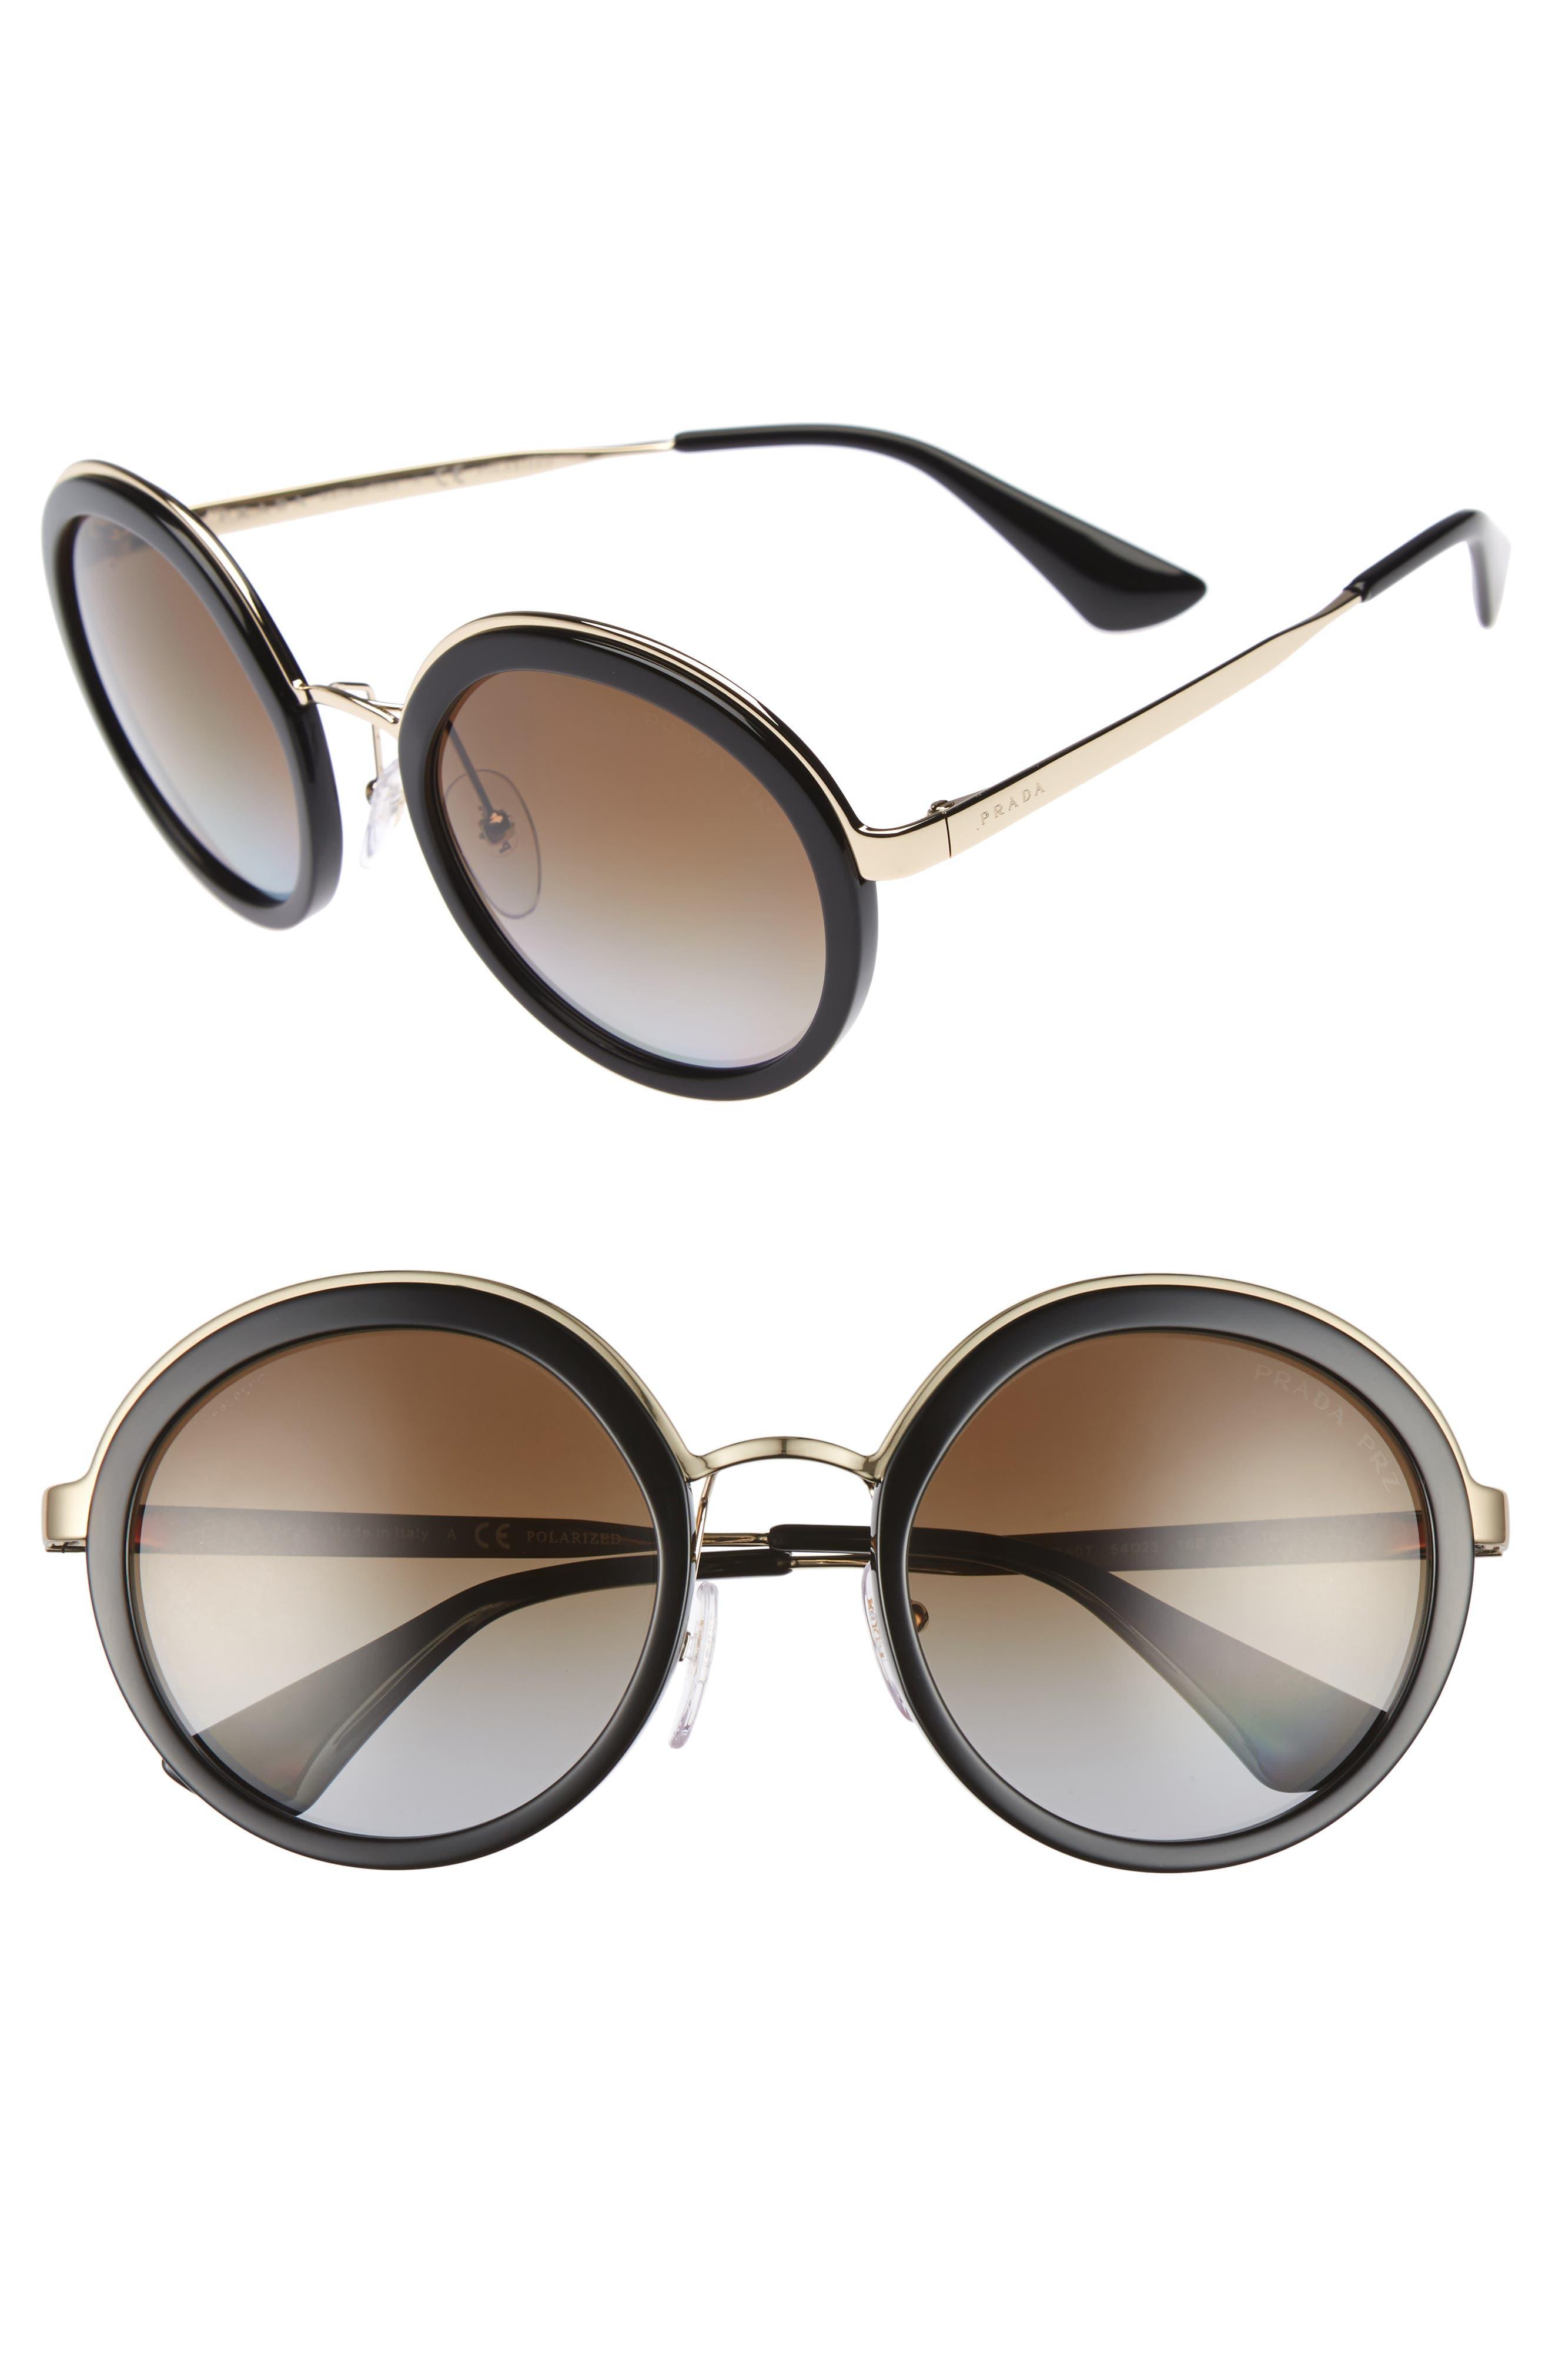 54mm Polarized Round Sunglasses,                         Main,                         color, 001